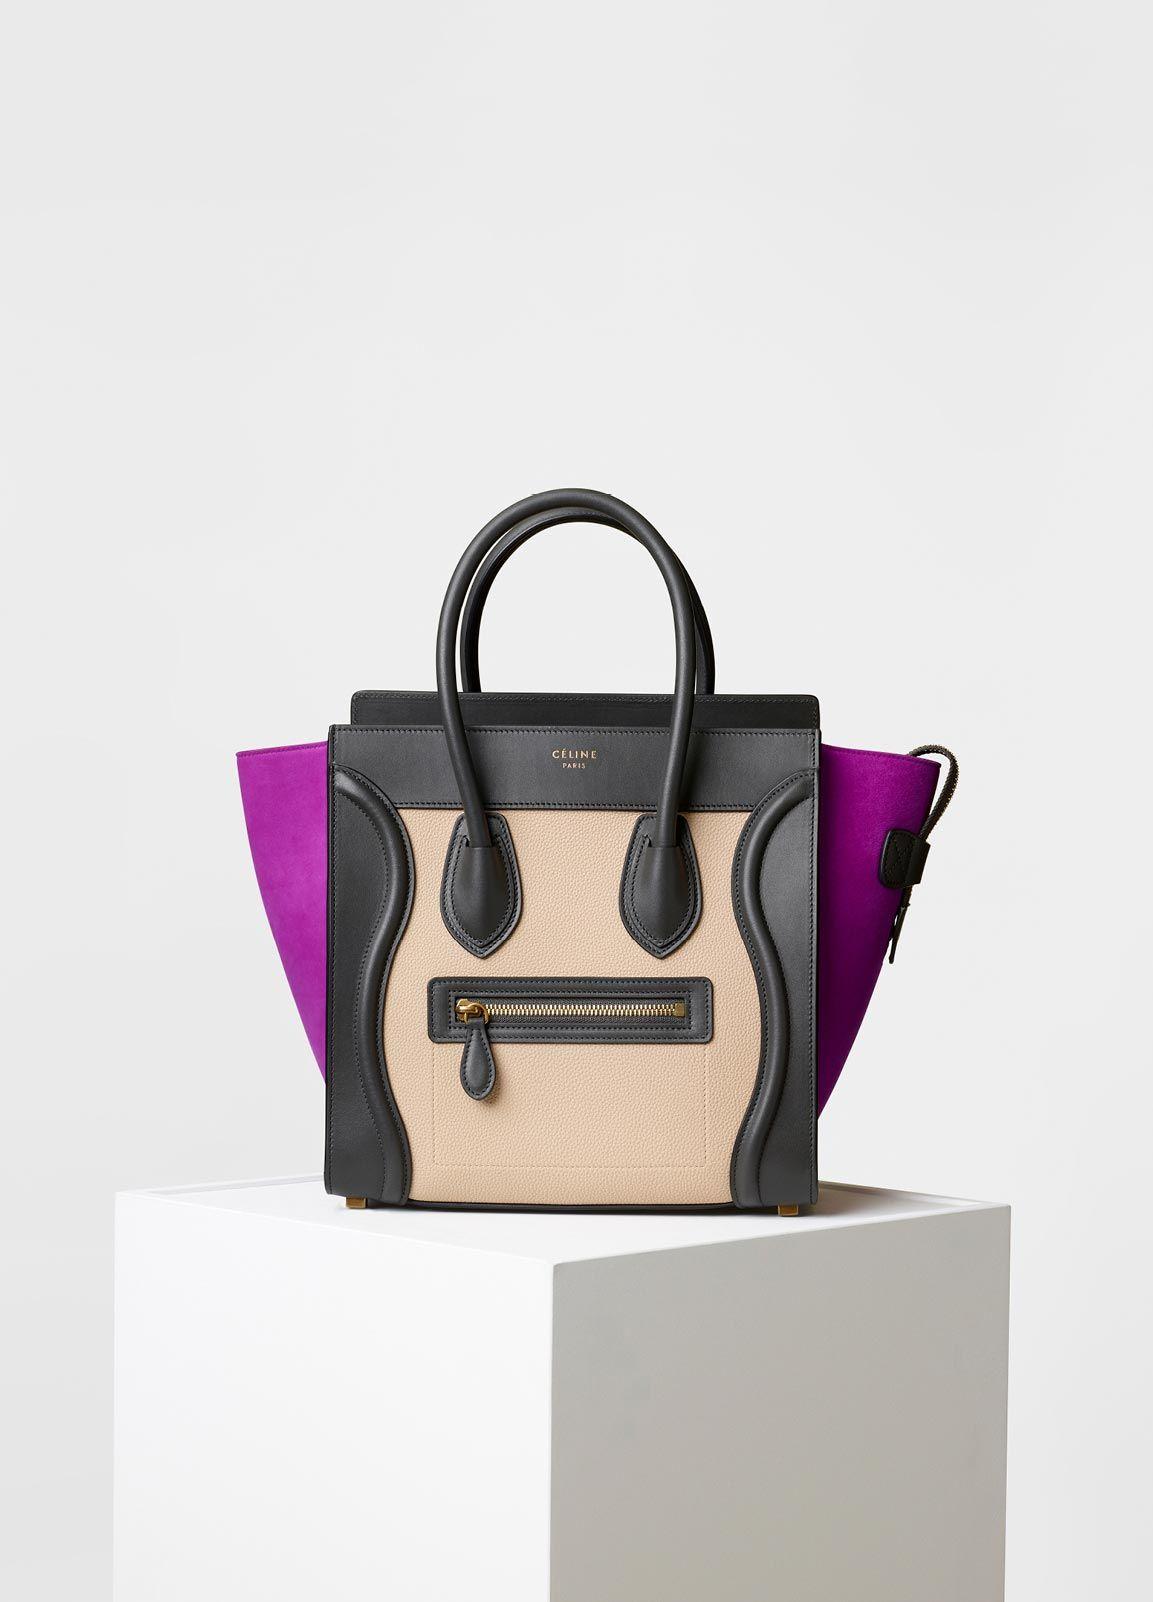 Celine handbag bag 2017 spring collection season